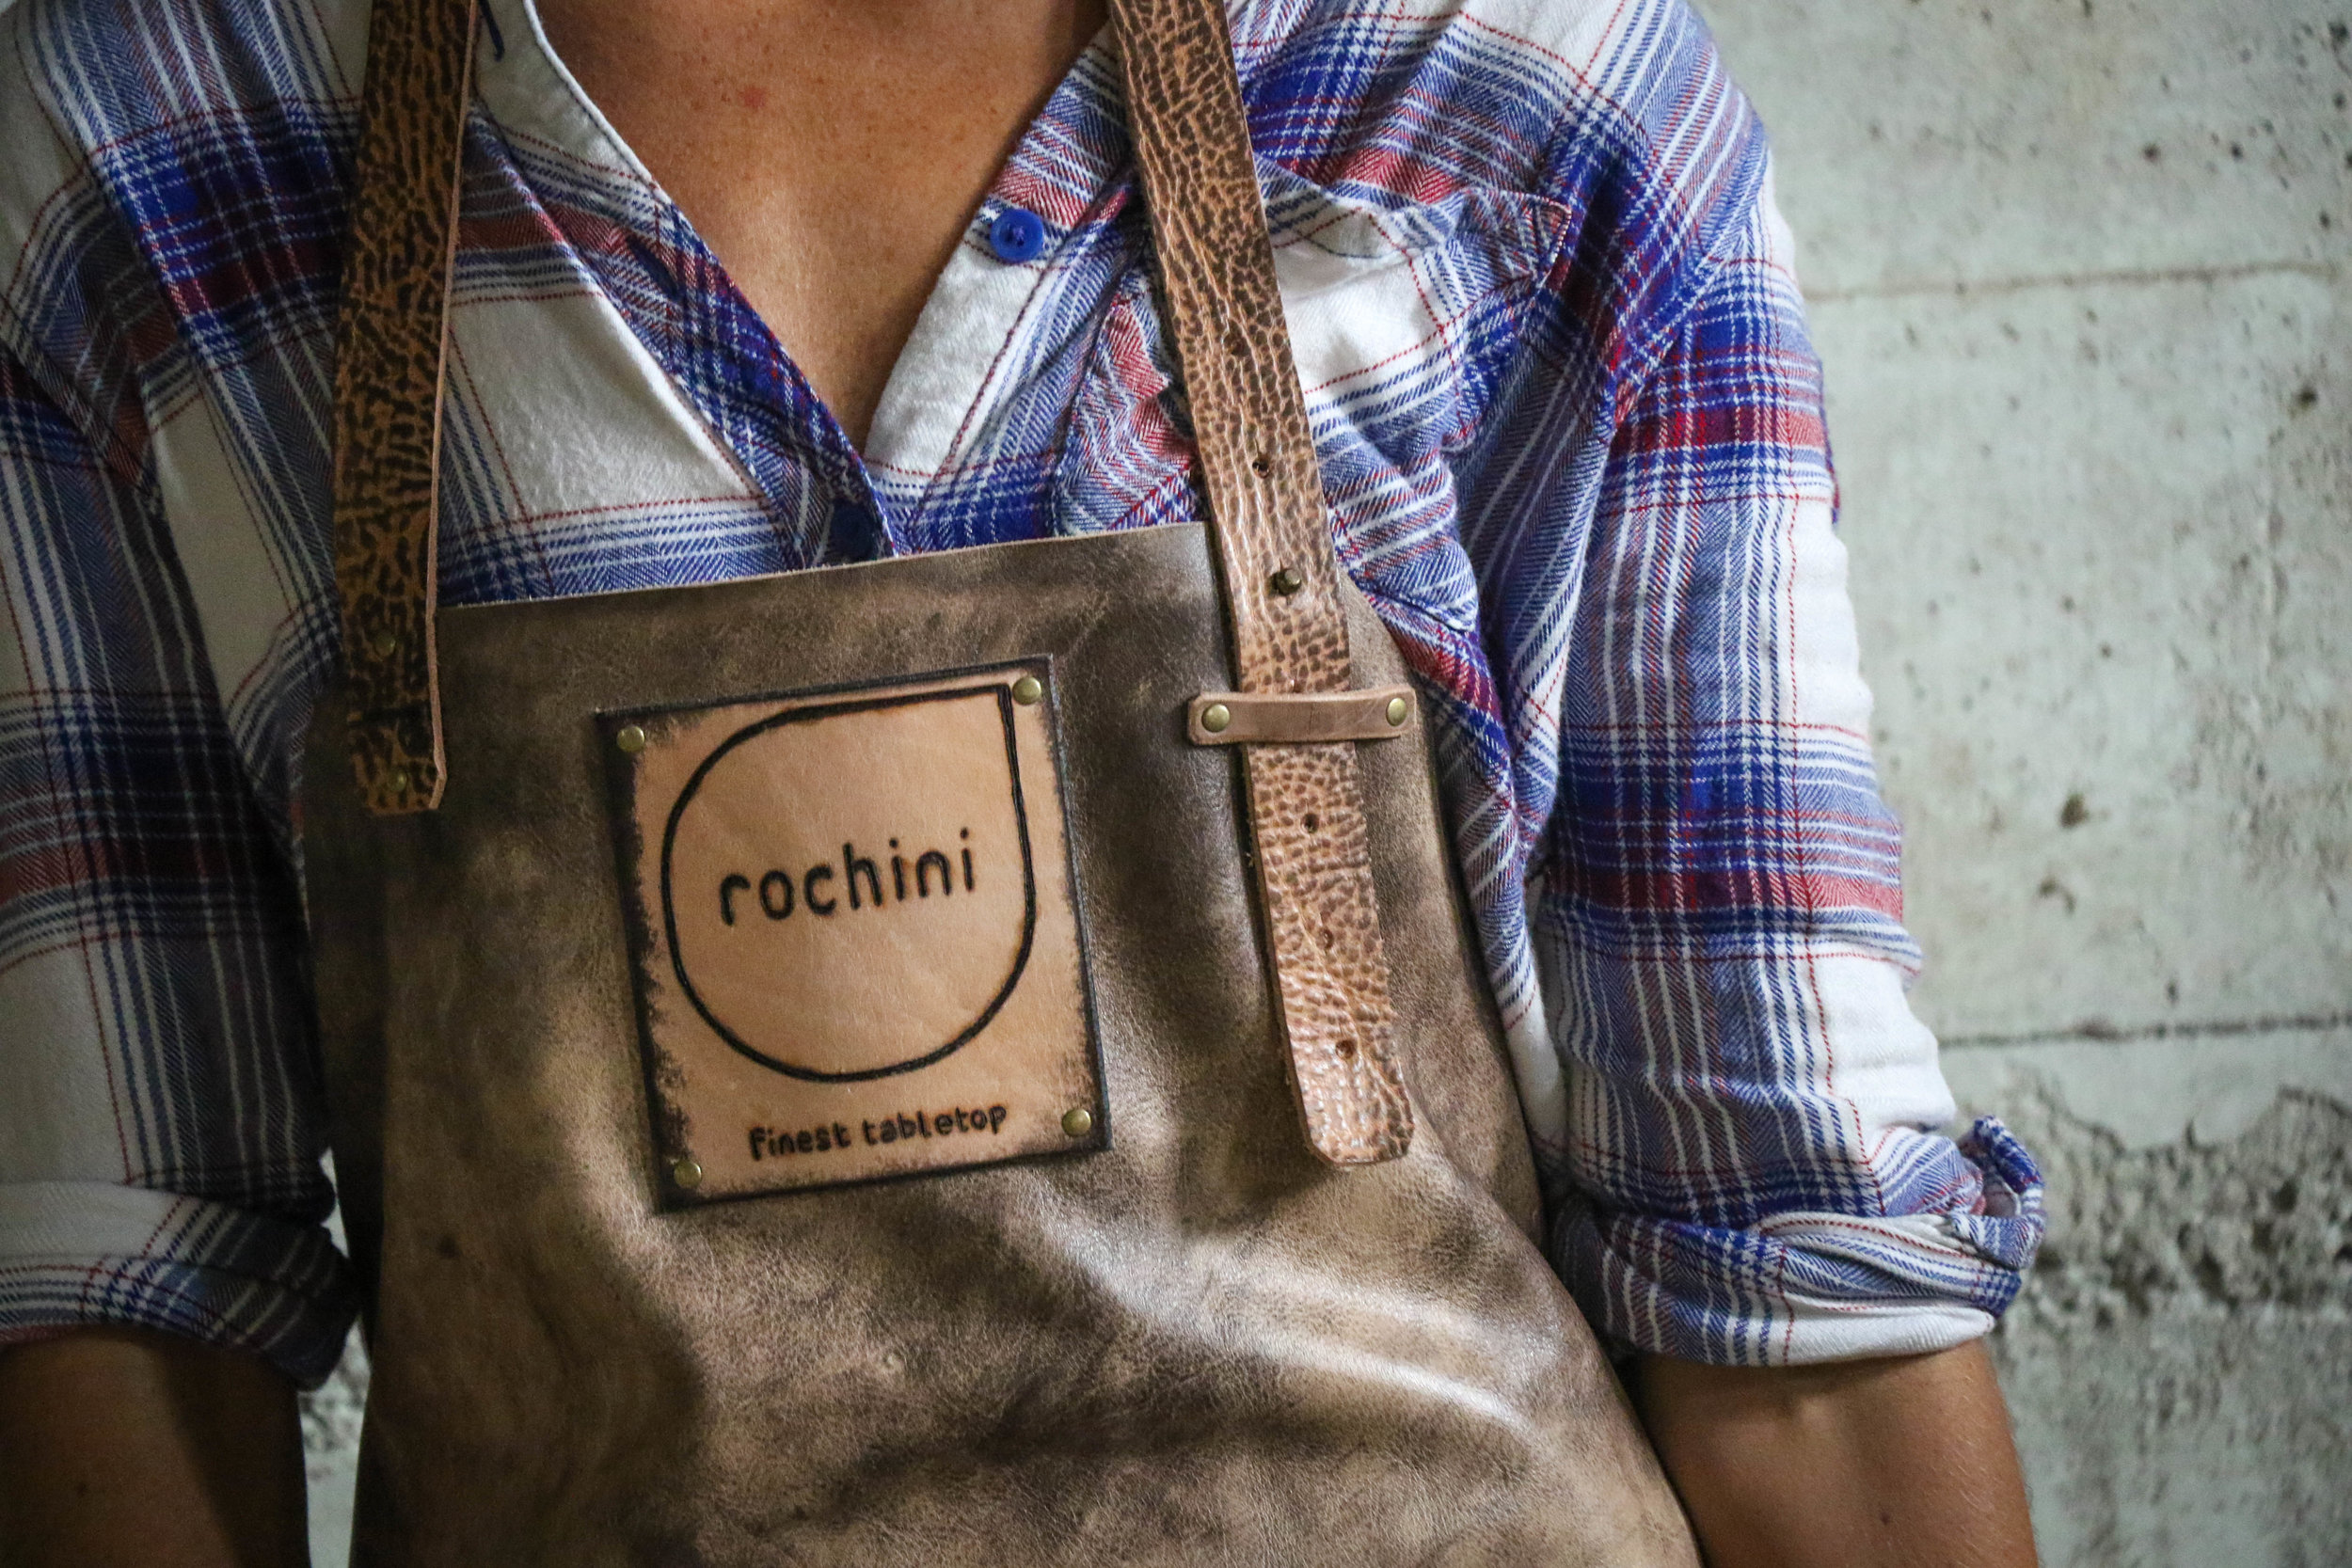 Rochini apron.jpg